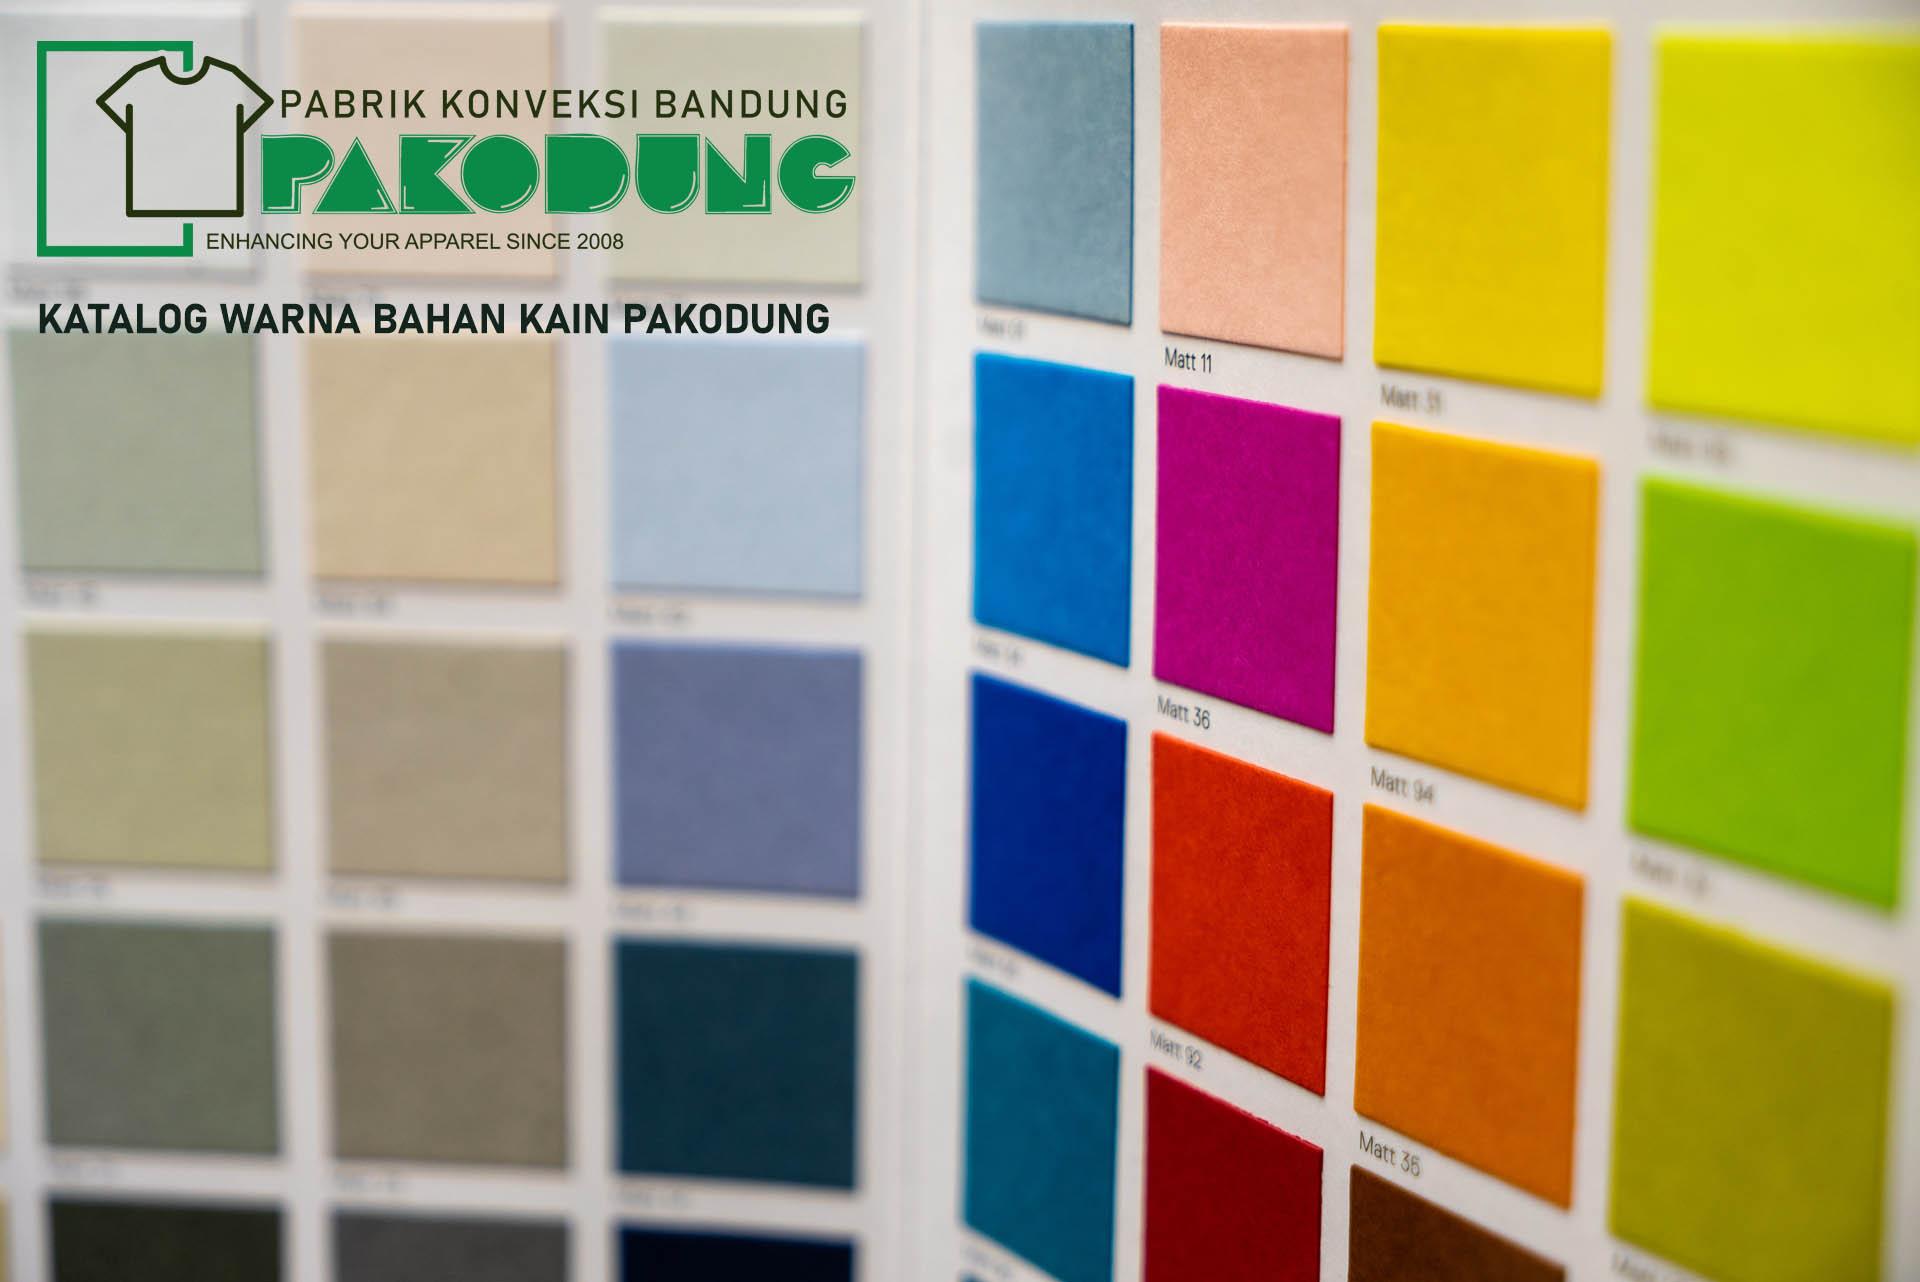 Katalog Warna Bahan